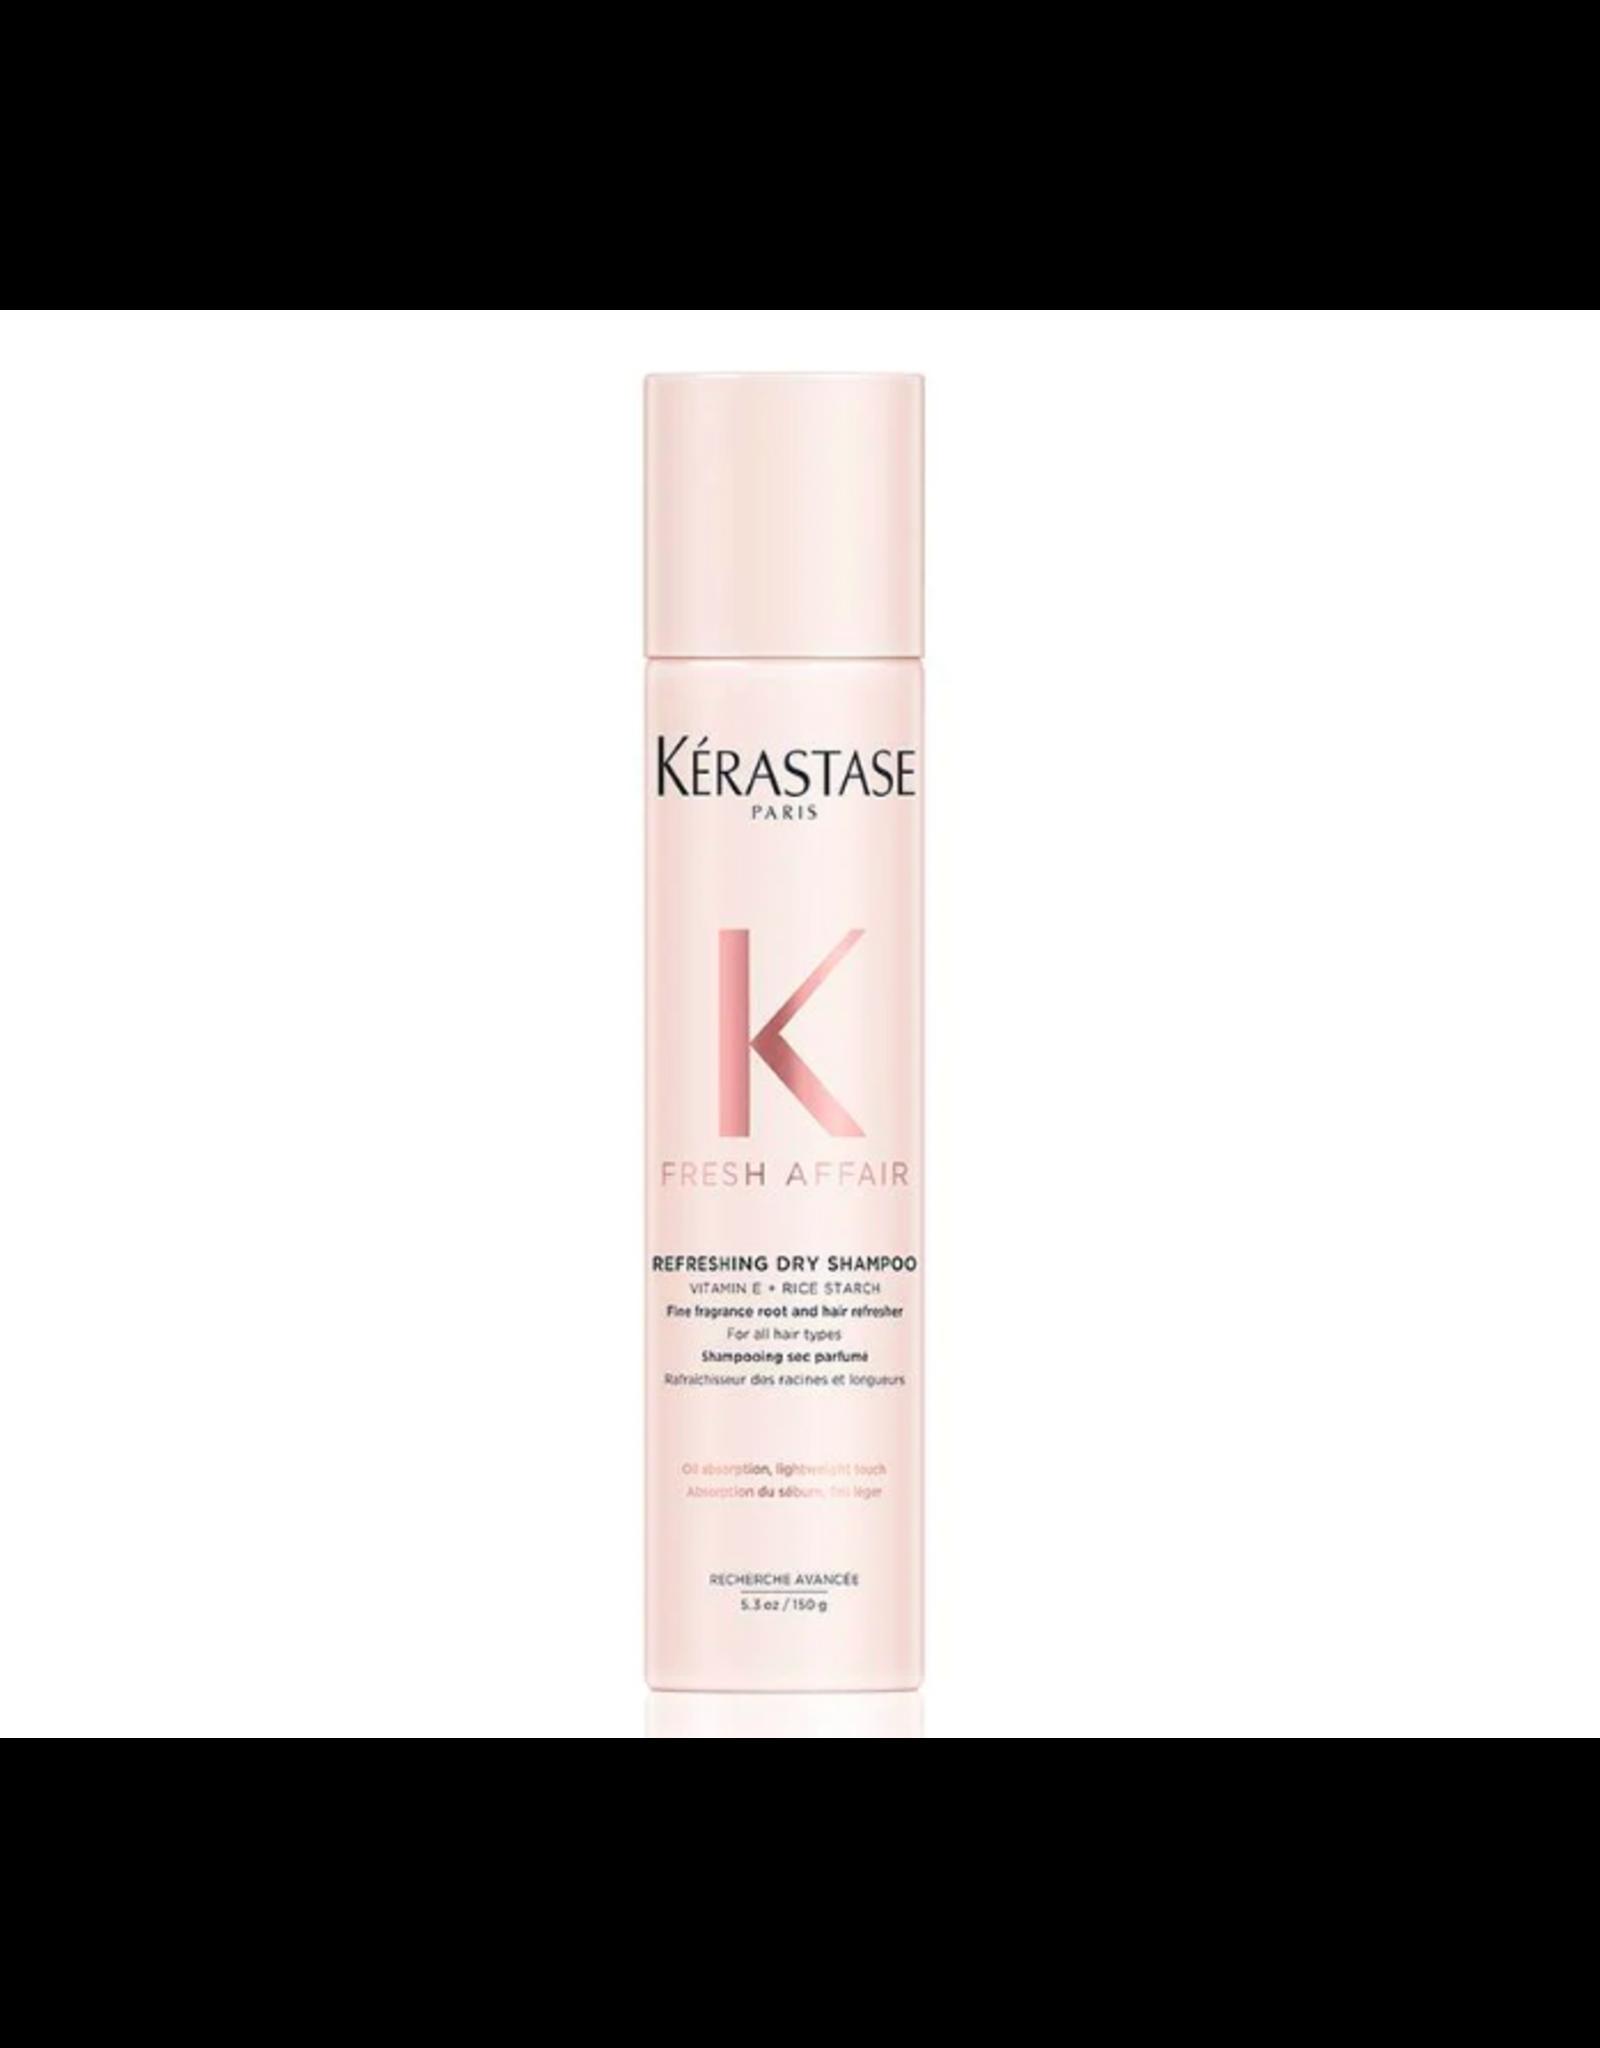 Kerastase Kérastase Fresh Affair Refreshing Dry Shampoo